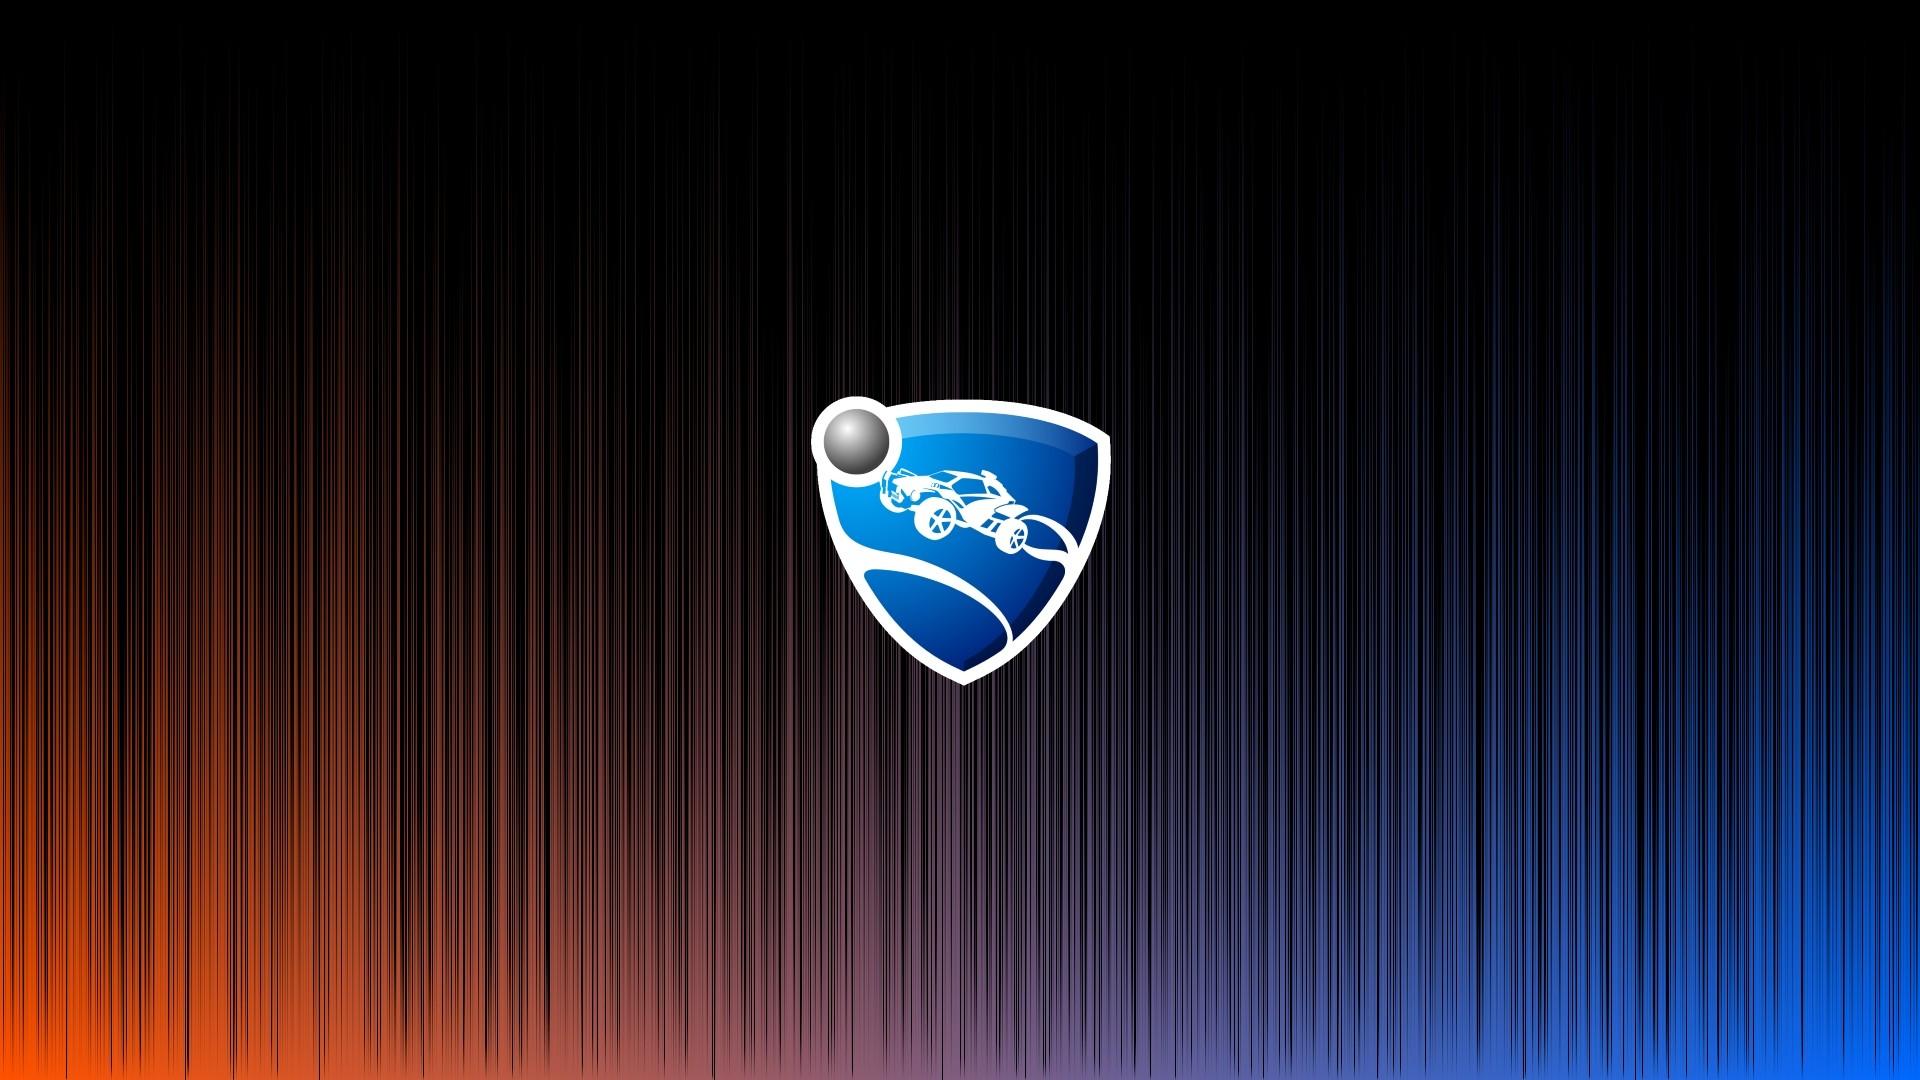 Sfondi Nero Auto Testo Logo Blu Arancia Calcio Rocket